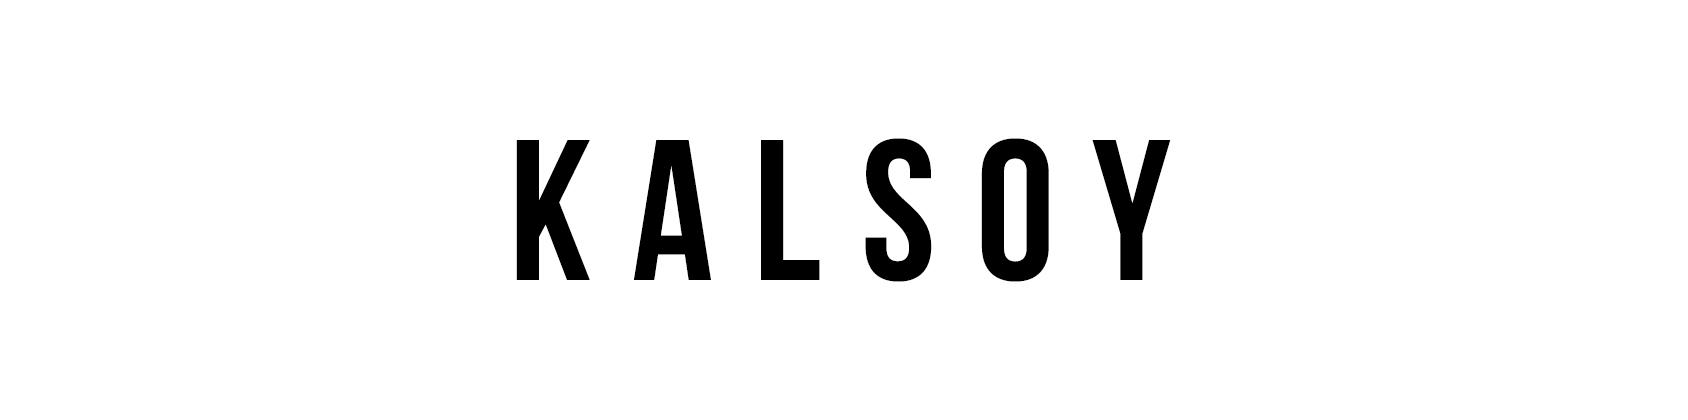 kalsoy.jpg